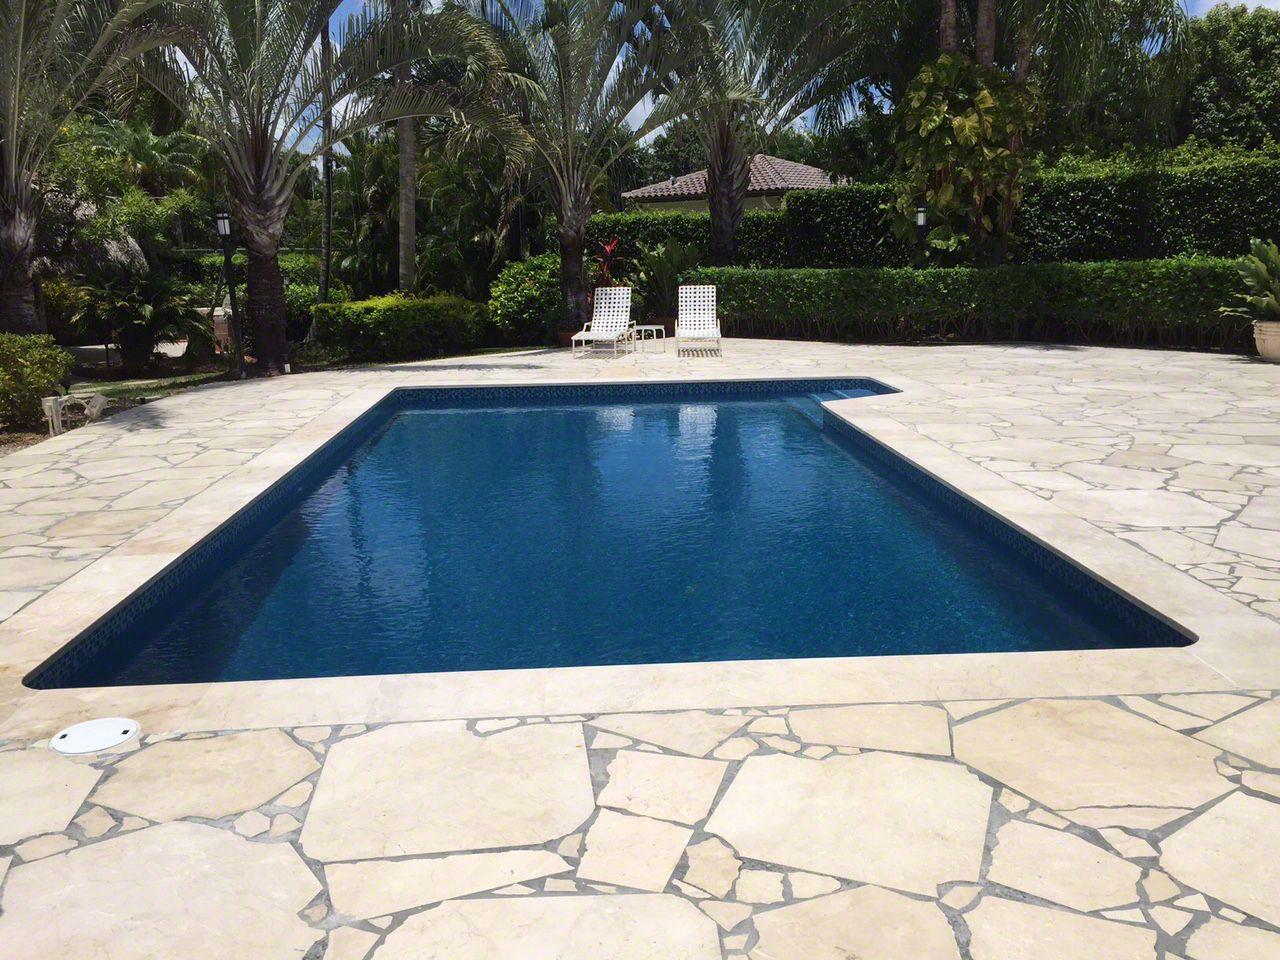 South Miami Residence Marmol Miami Residence South Miami Residences